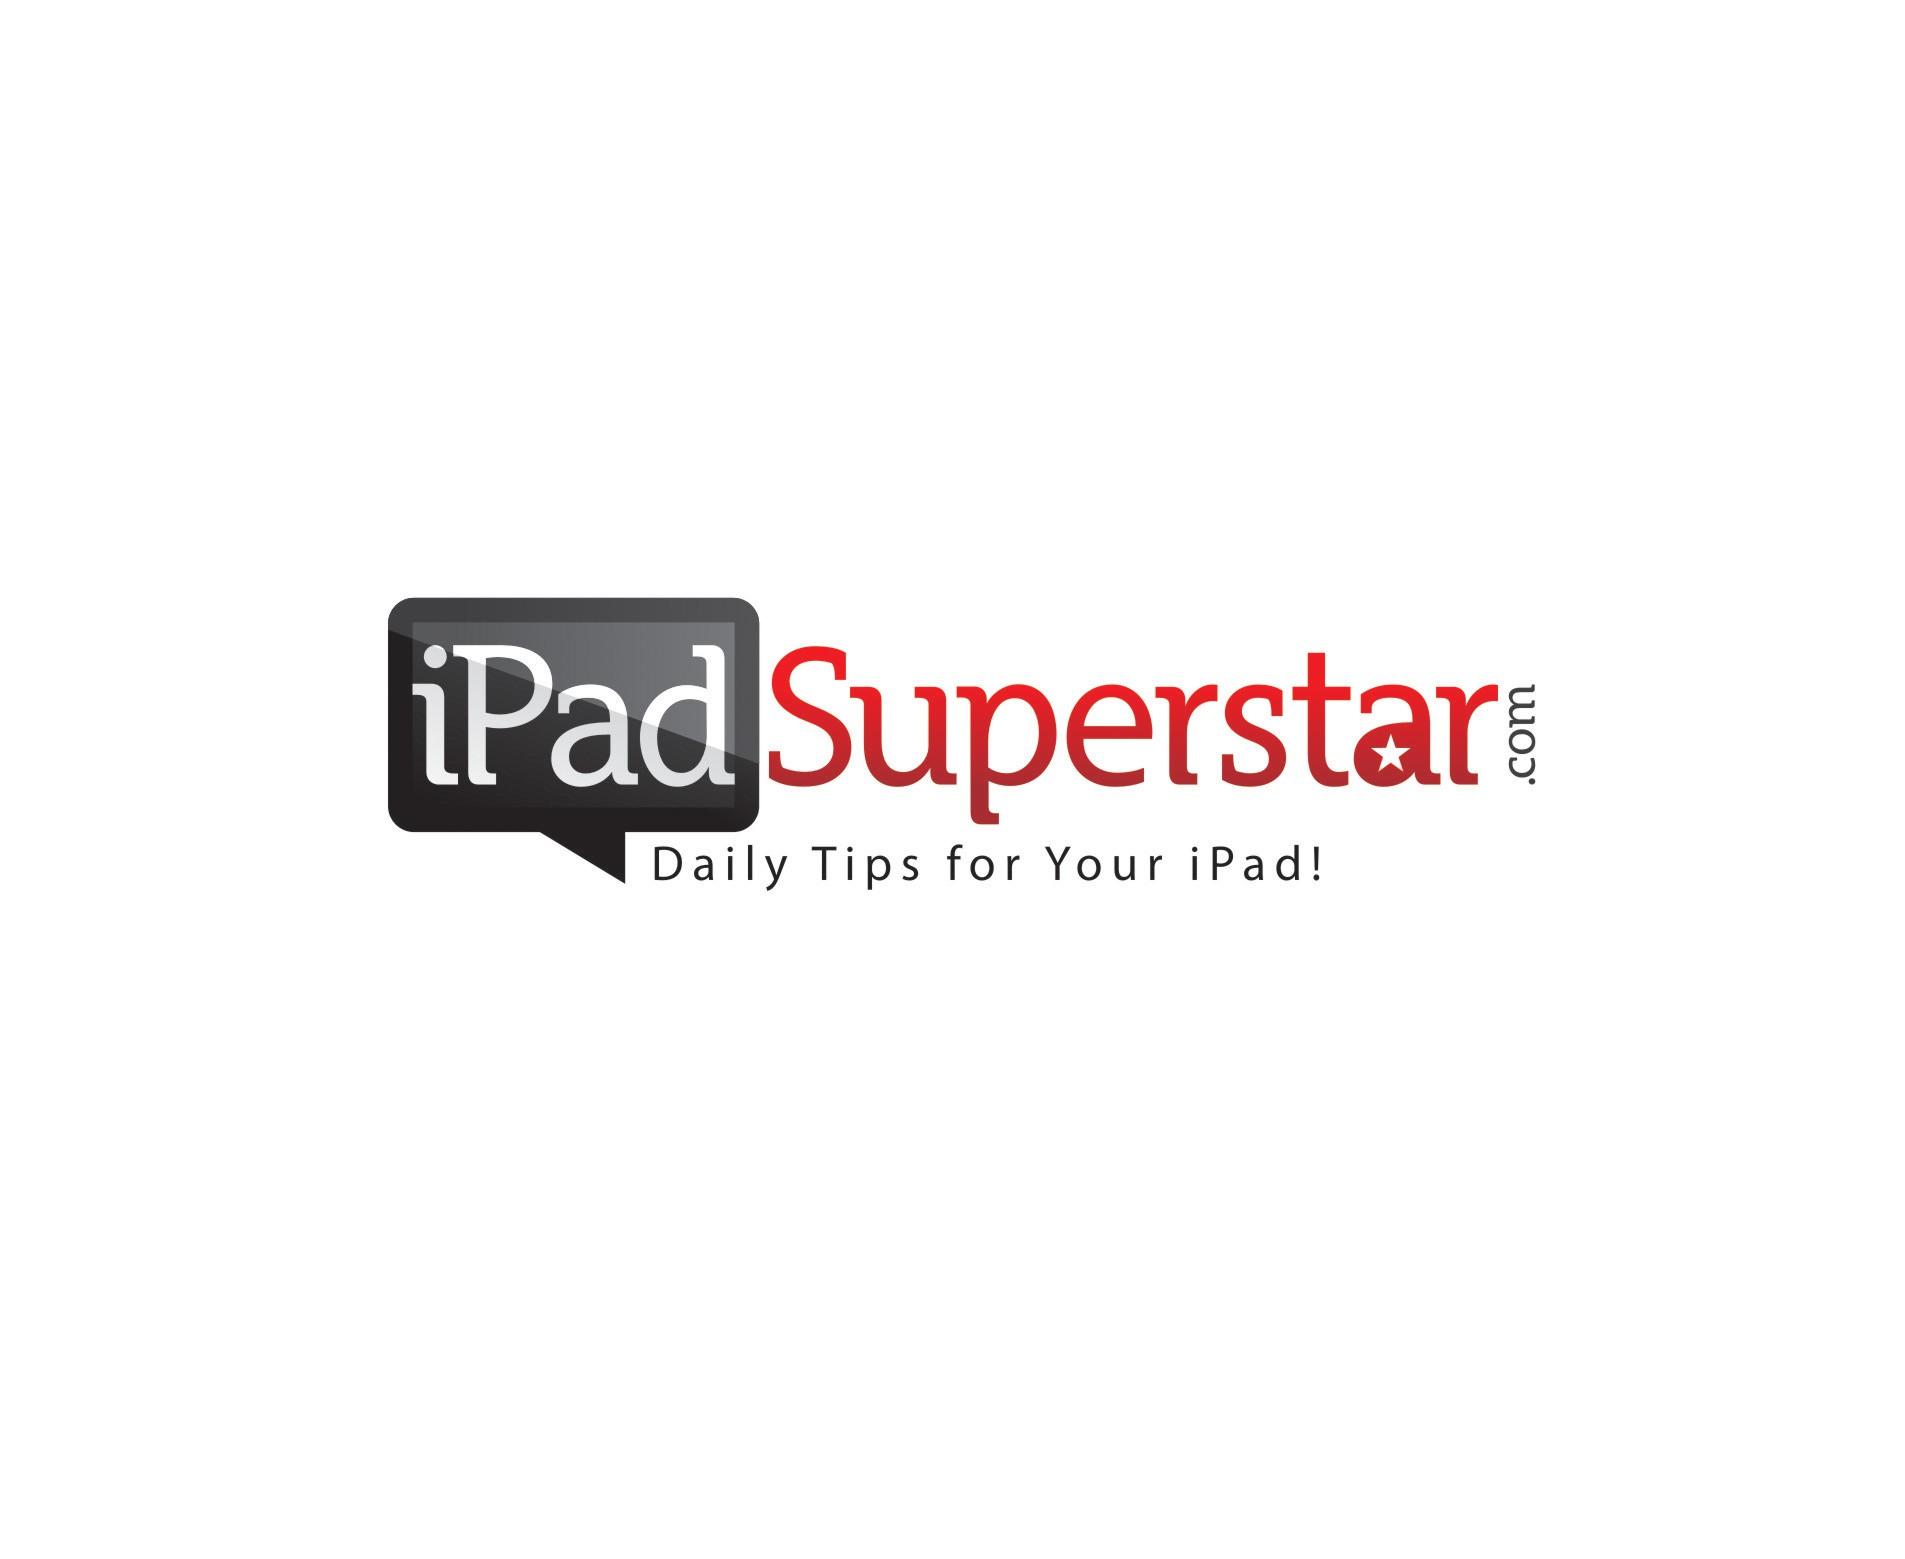 logo for iPadSuperstar.com